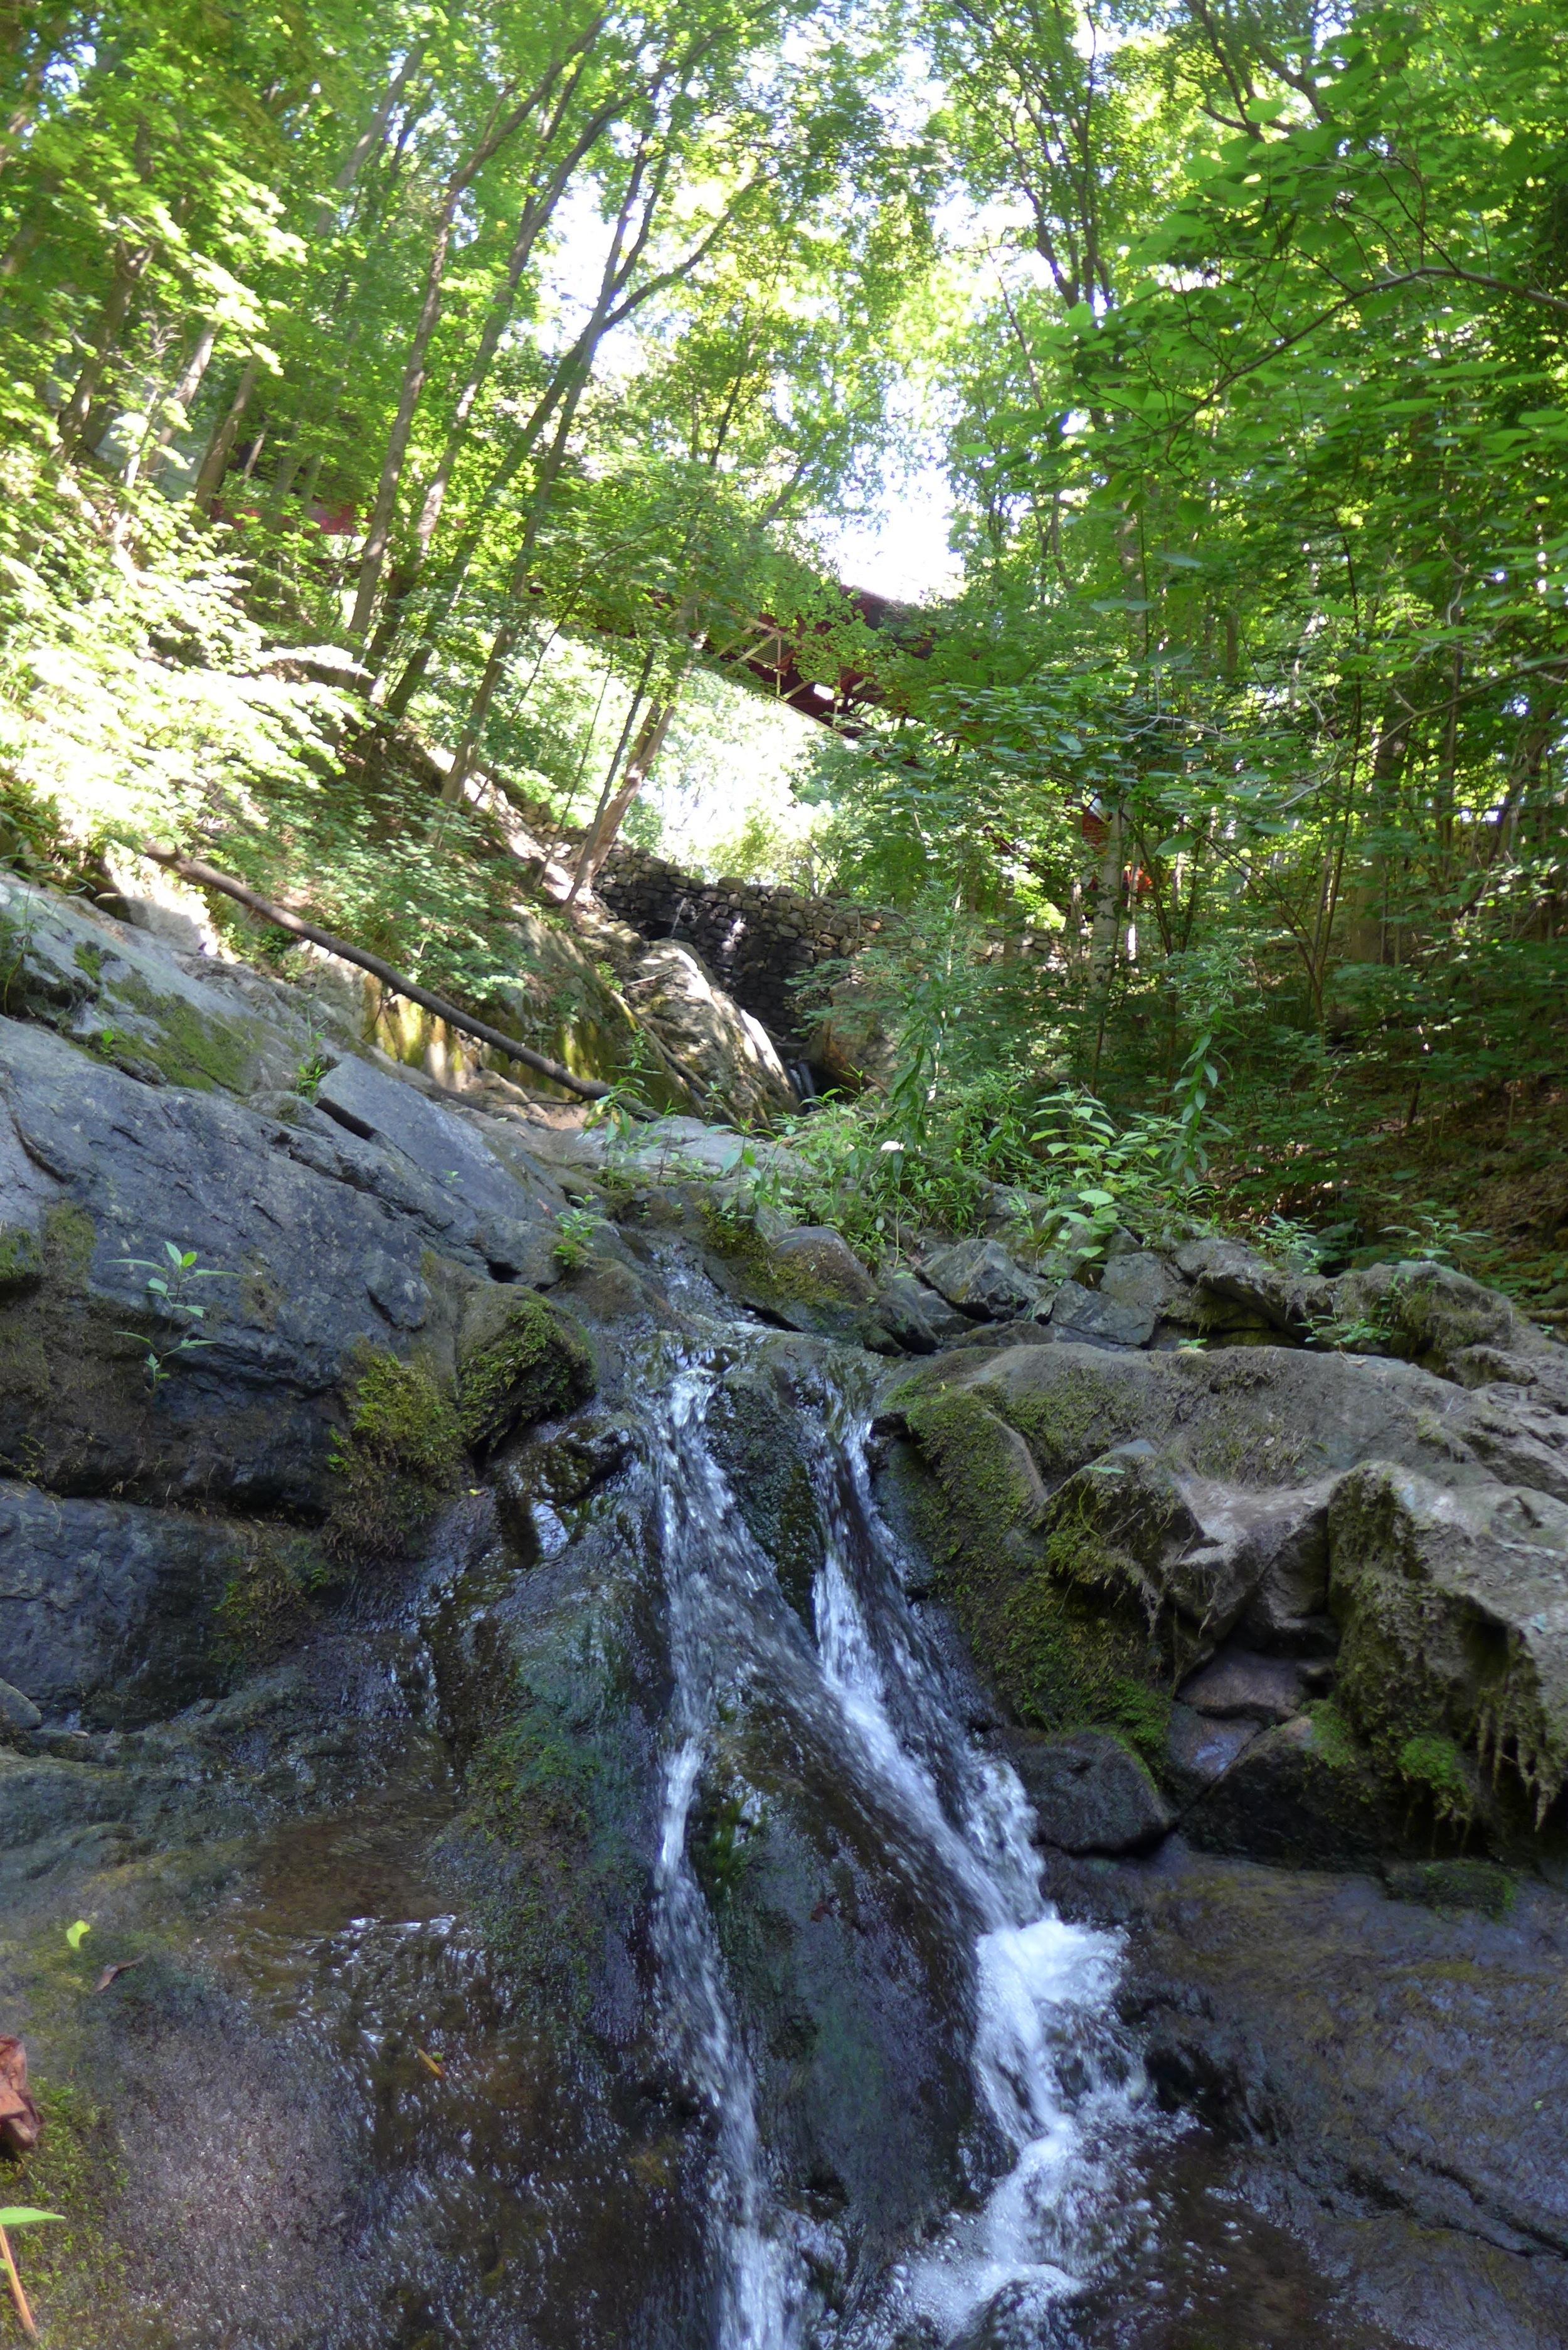 dam-foundry-brook-atelier-mile-away.jpg